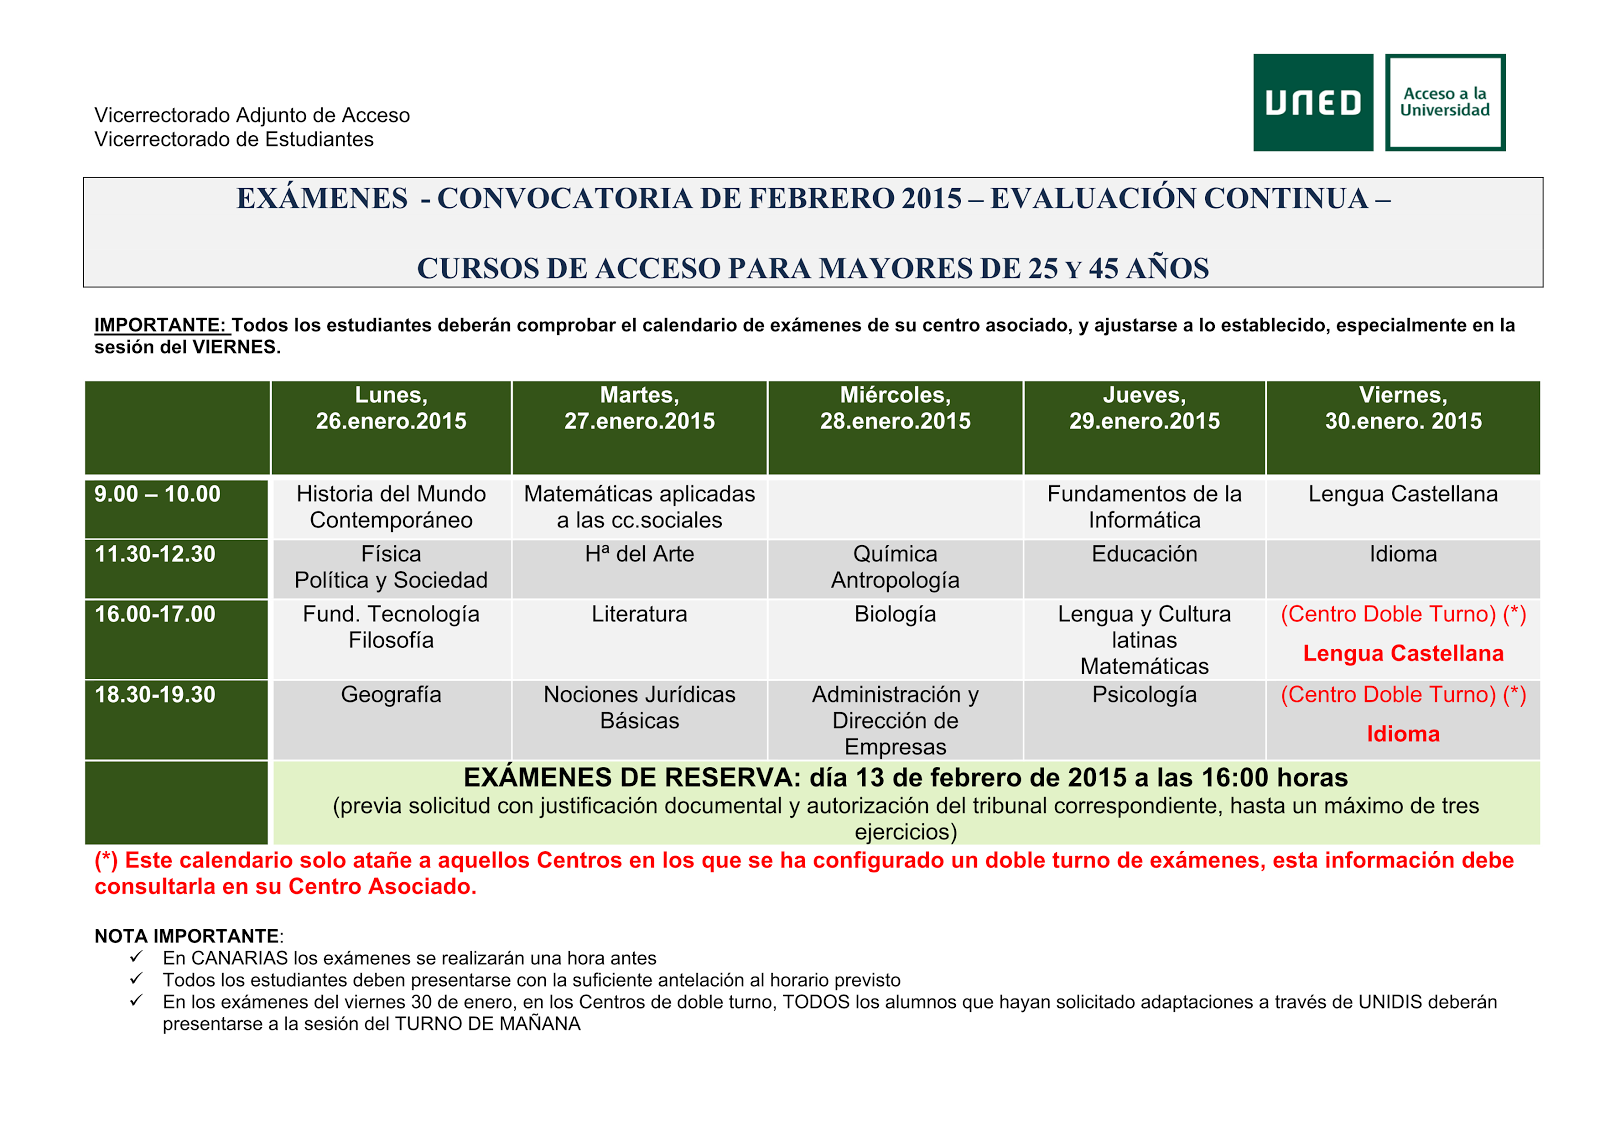 Uned Calendario Examenes.Uned Aula De Coria Caceres 2014